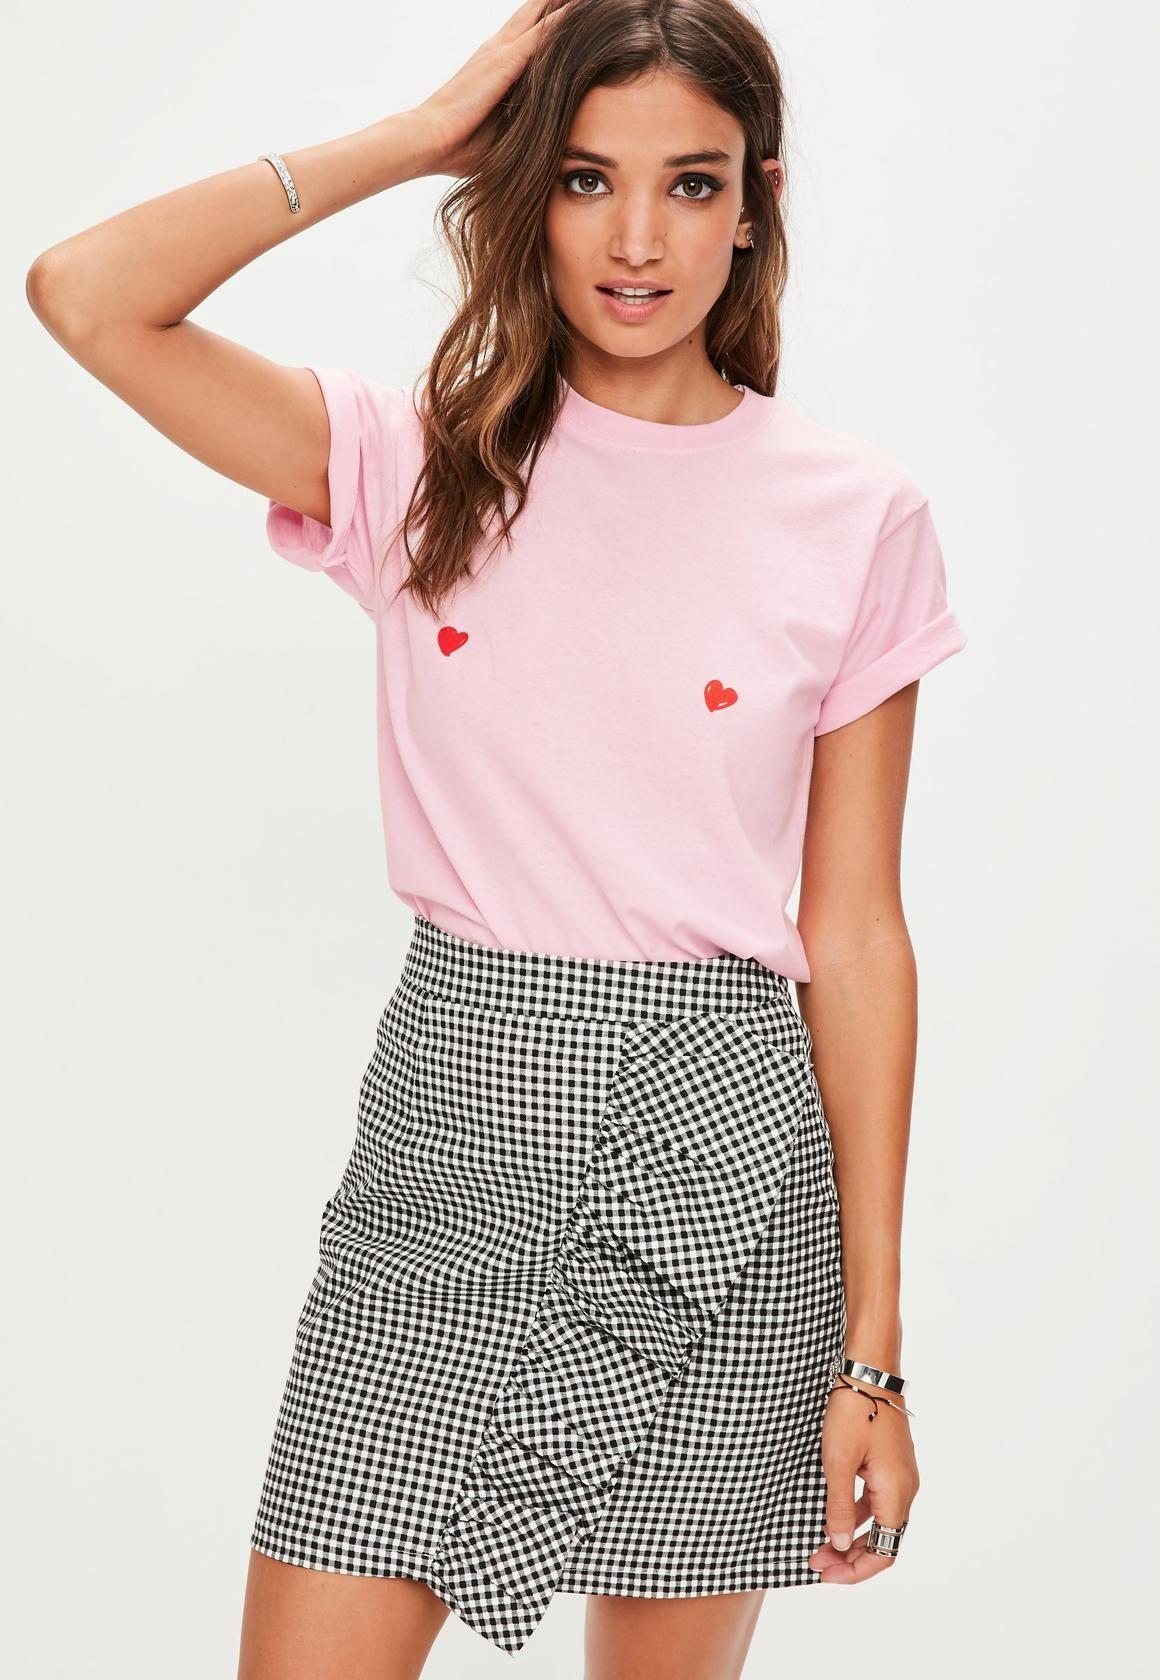 ae6dd9f62cd Pink Heart Nipple Printed T-Shirt | Missguided | want it | Shirts ...